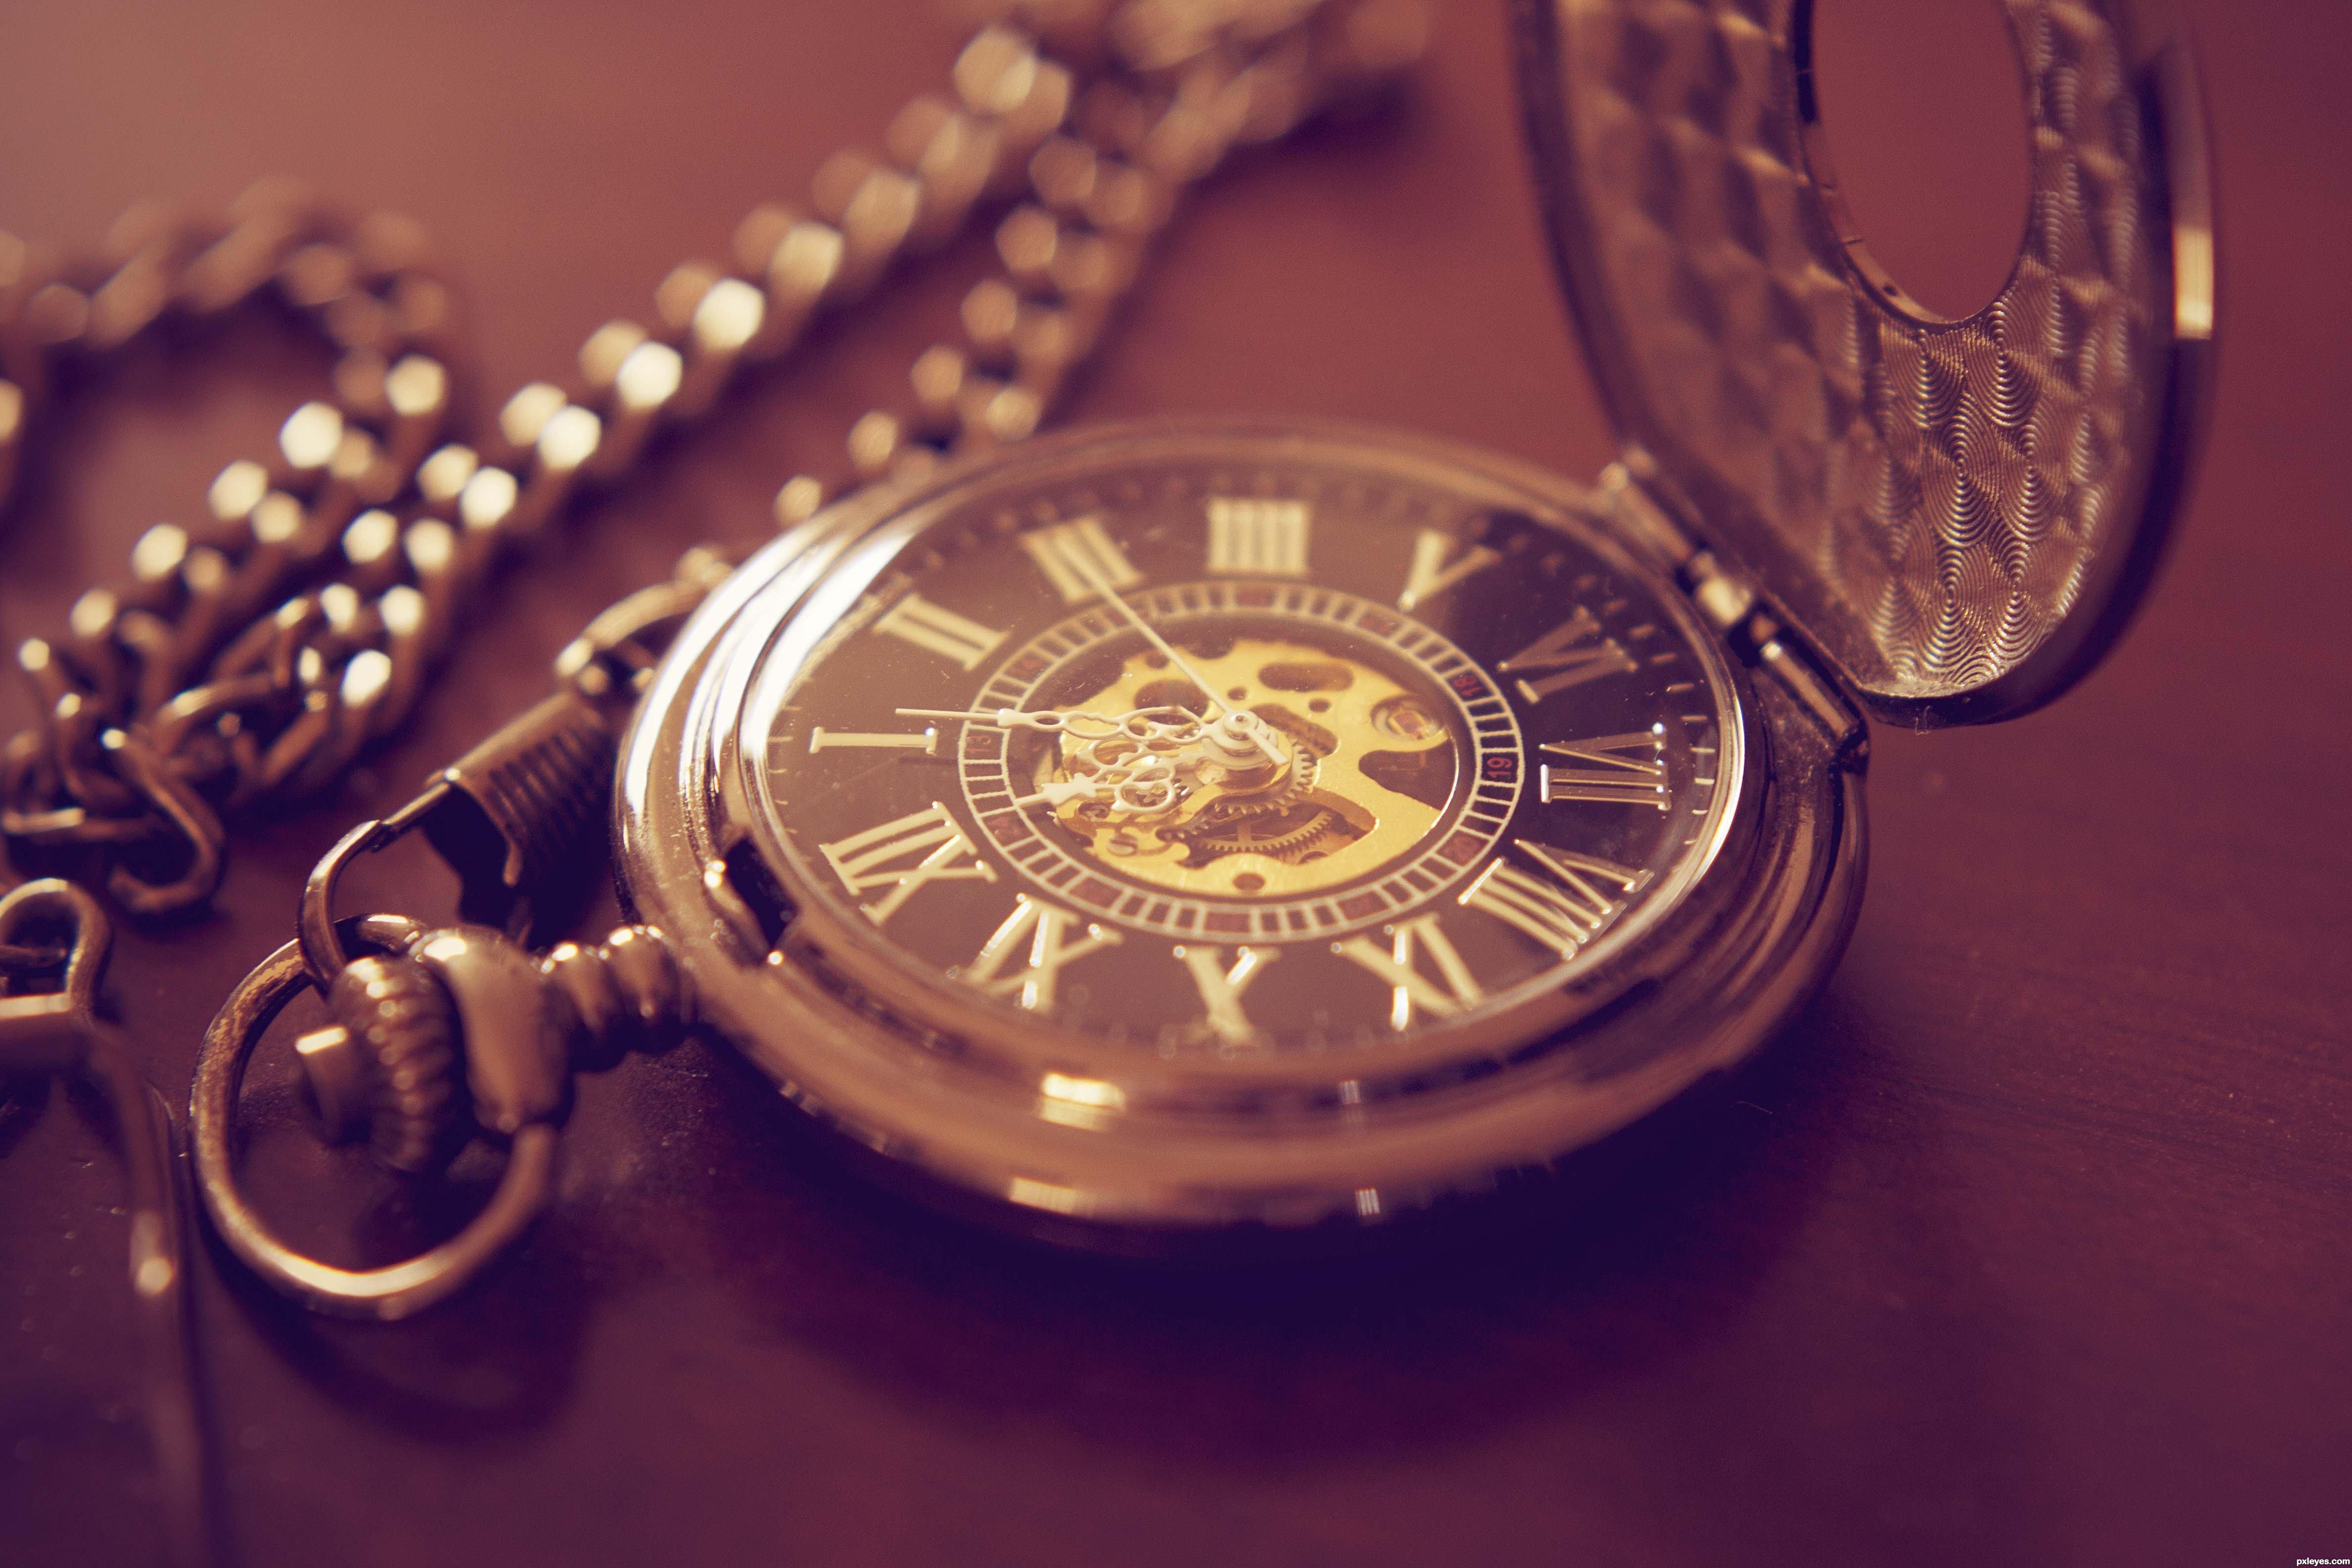 Pocket watch wallpaper  Pocket watch time clock bokeh wallpaper | 4752x3168 | 401856 ...